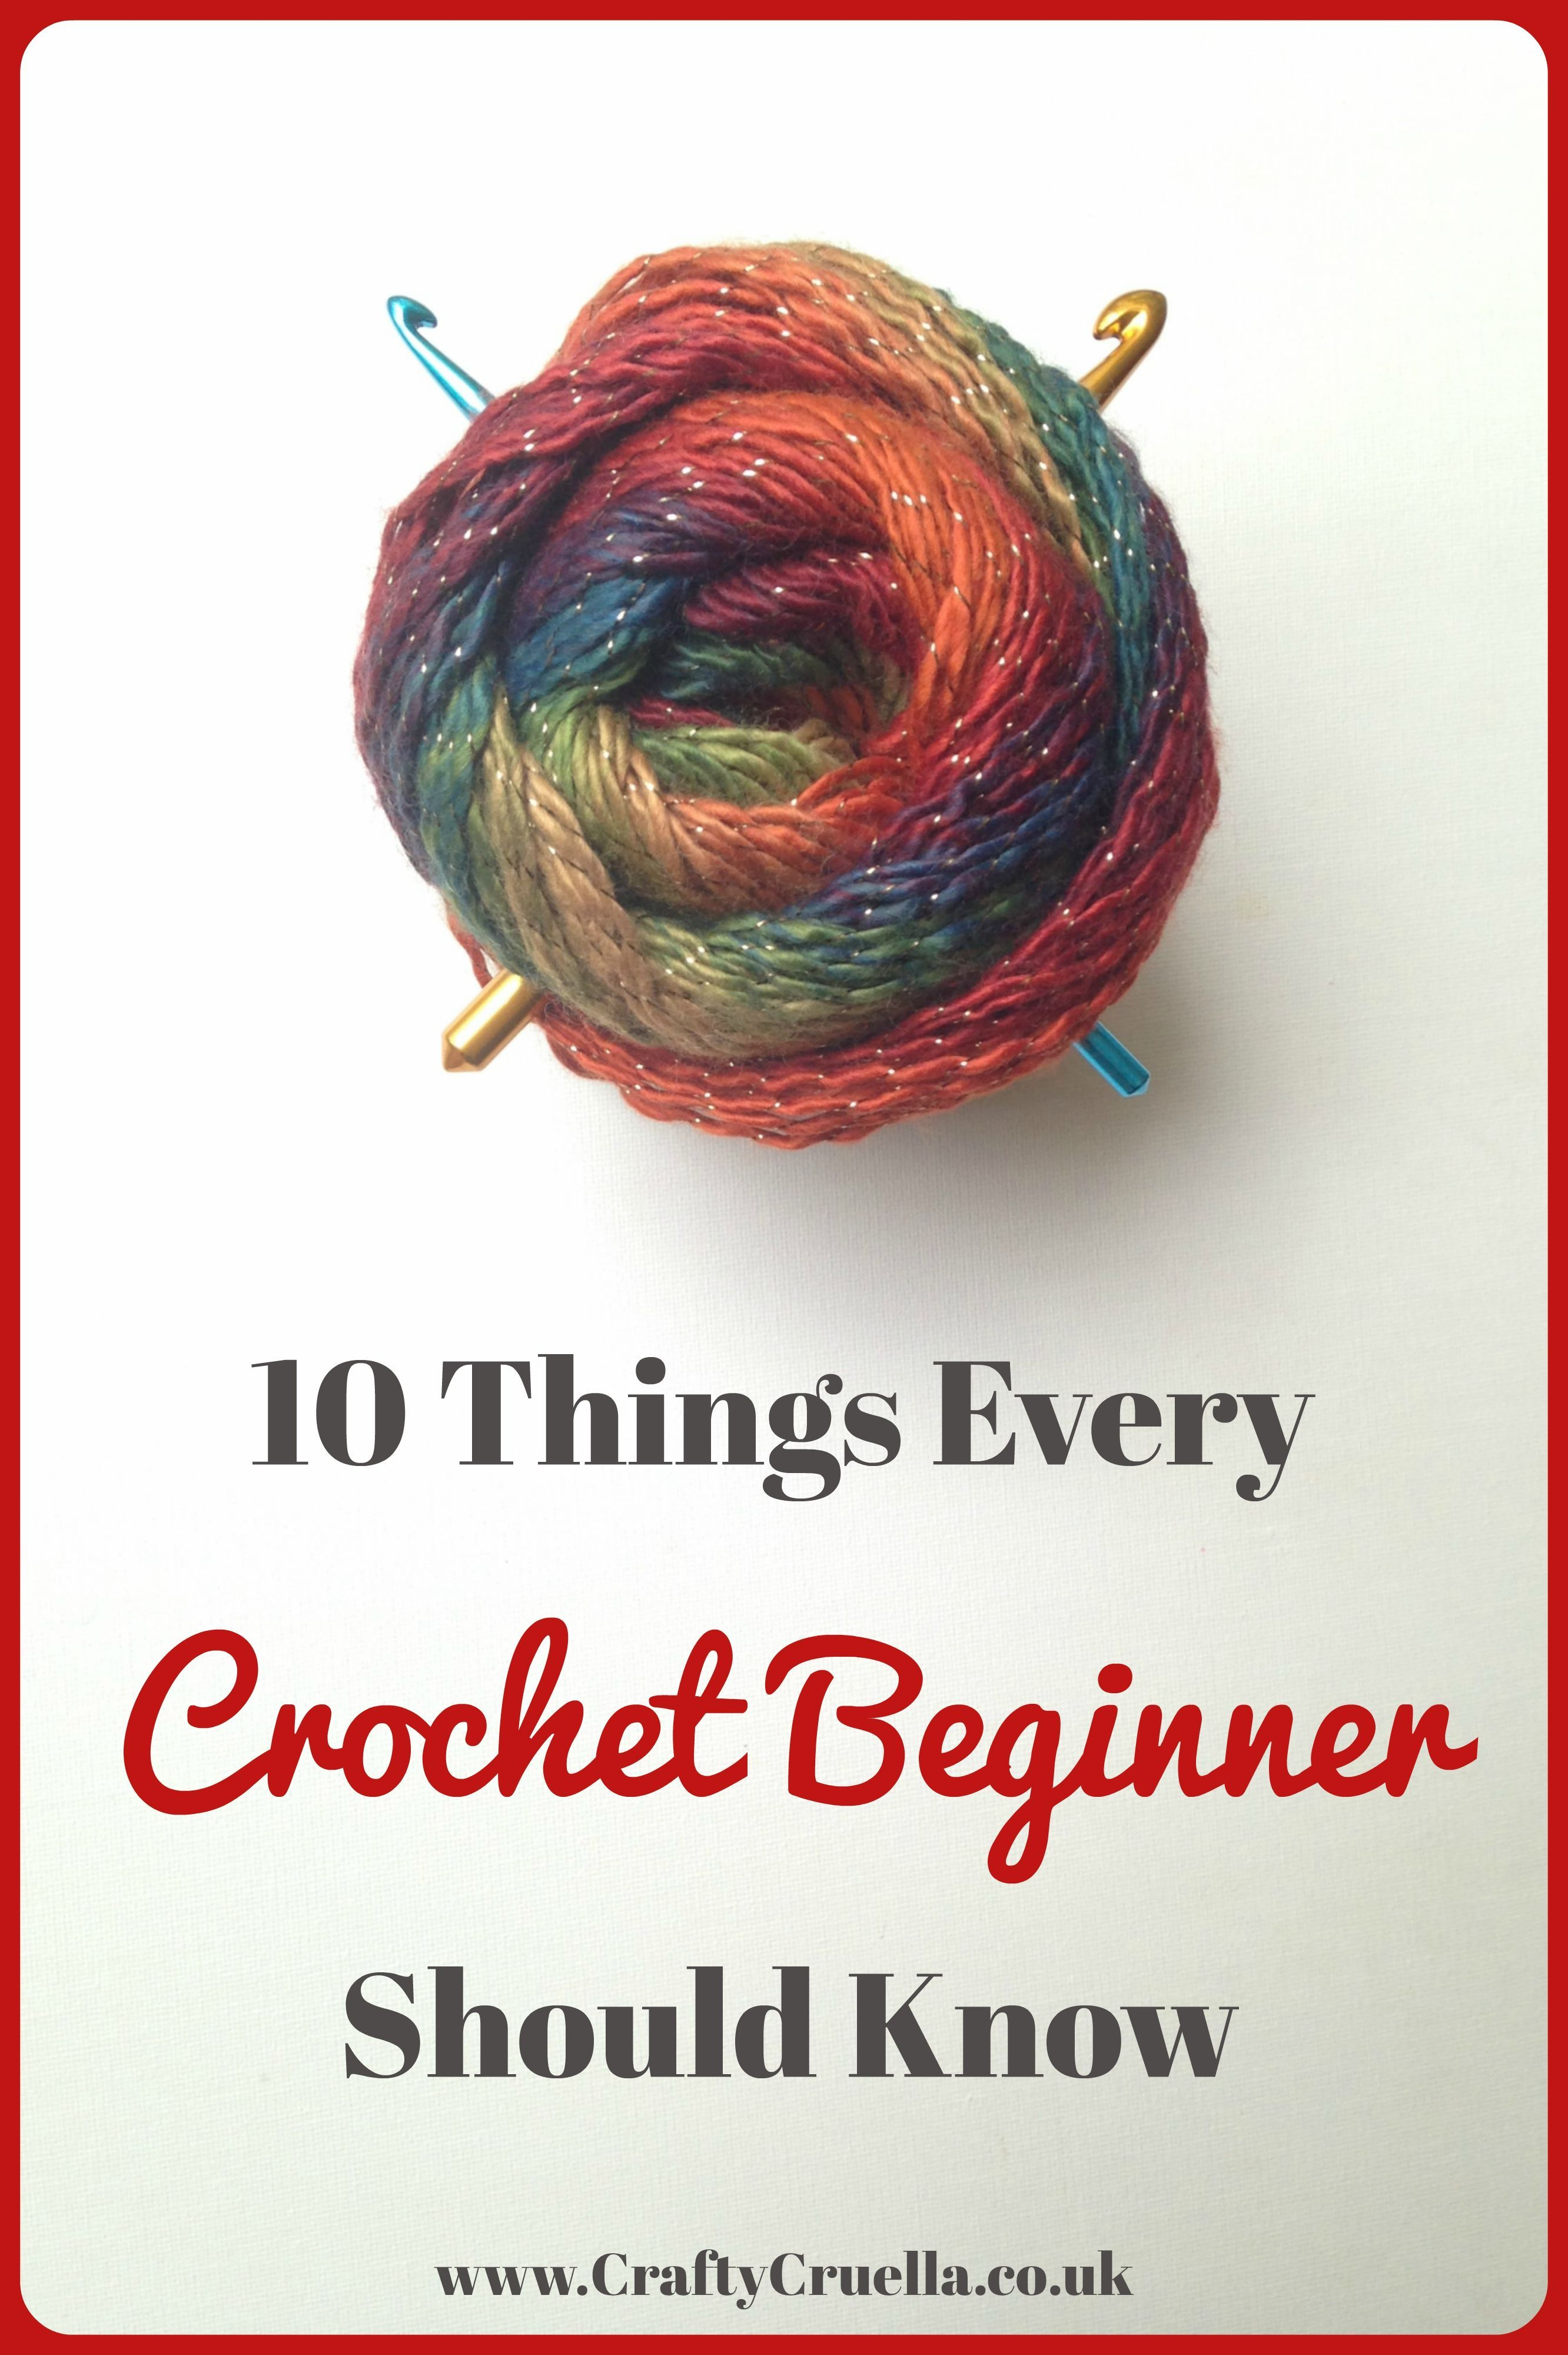 10 Things Every Crochet Beginner Should Know ~ by Crafty Cruella ...